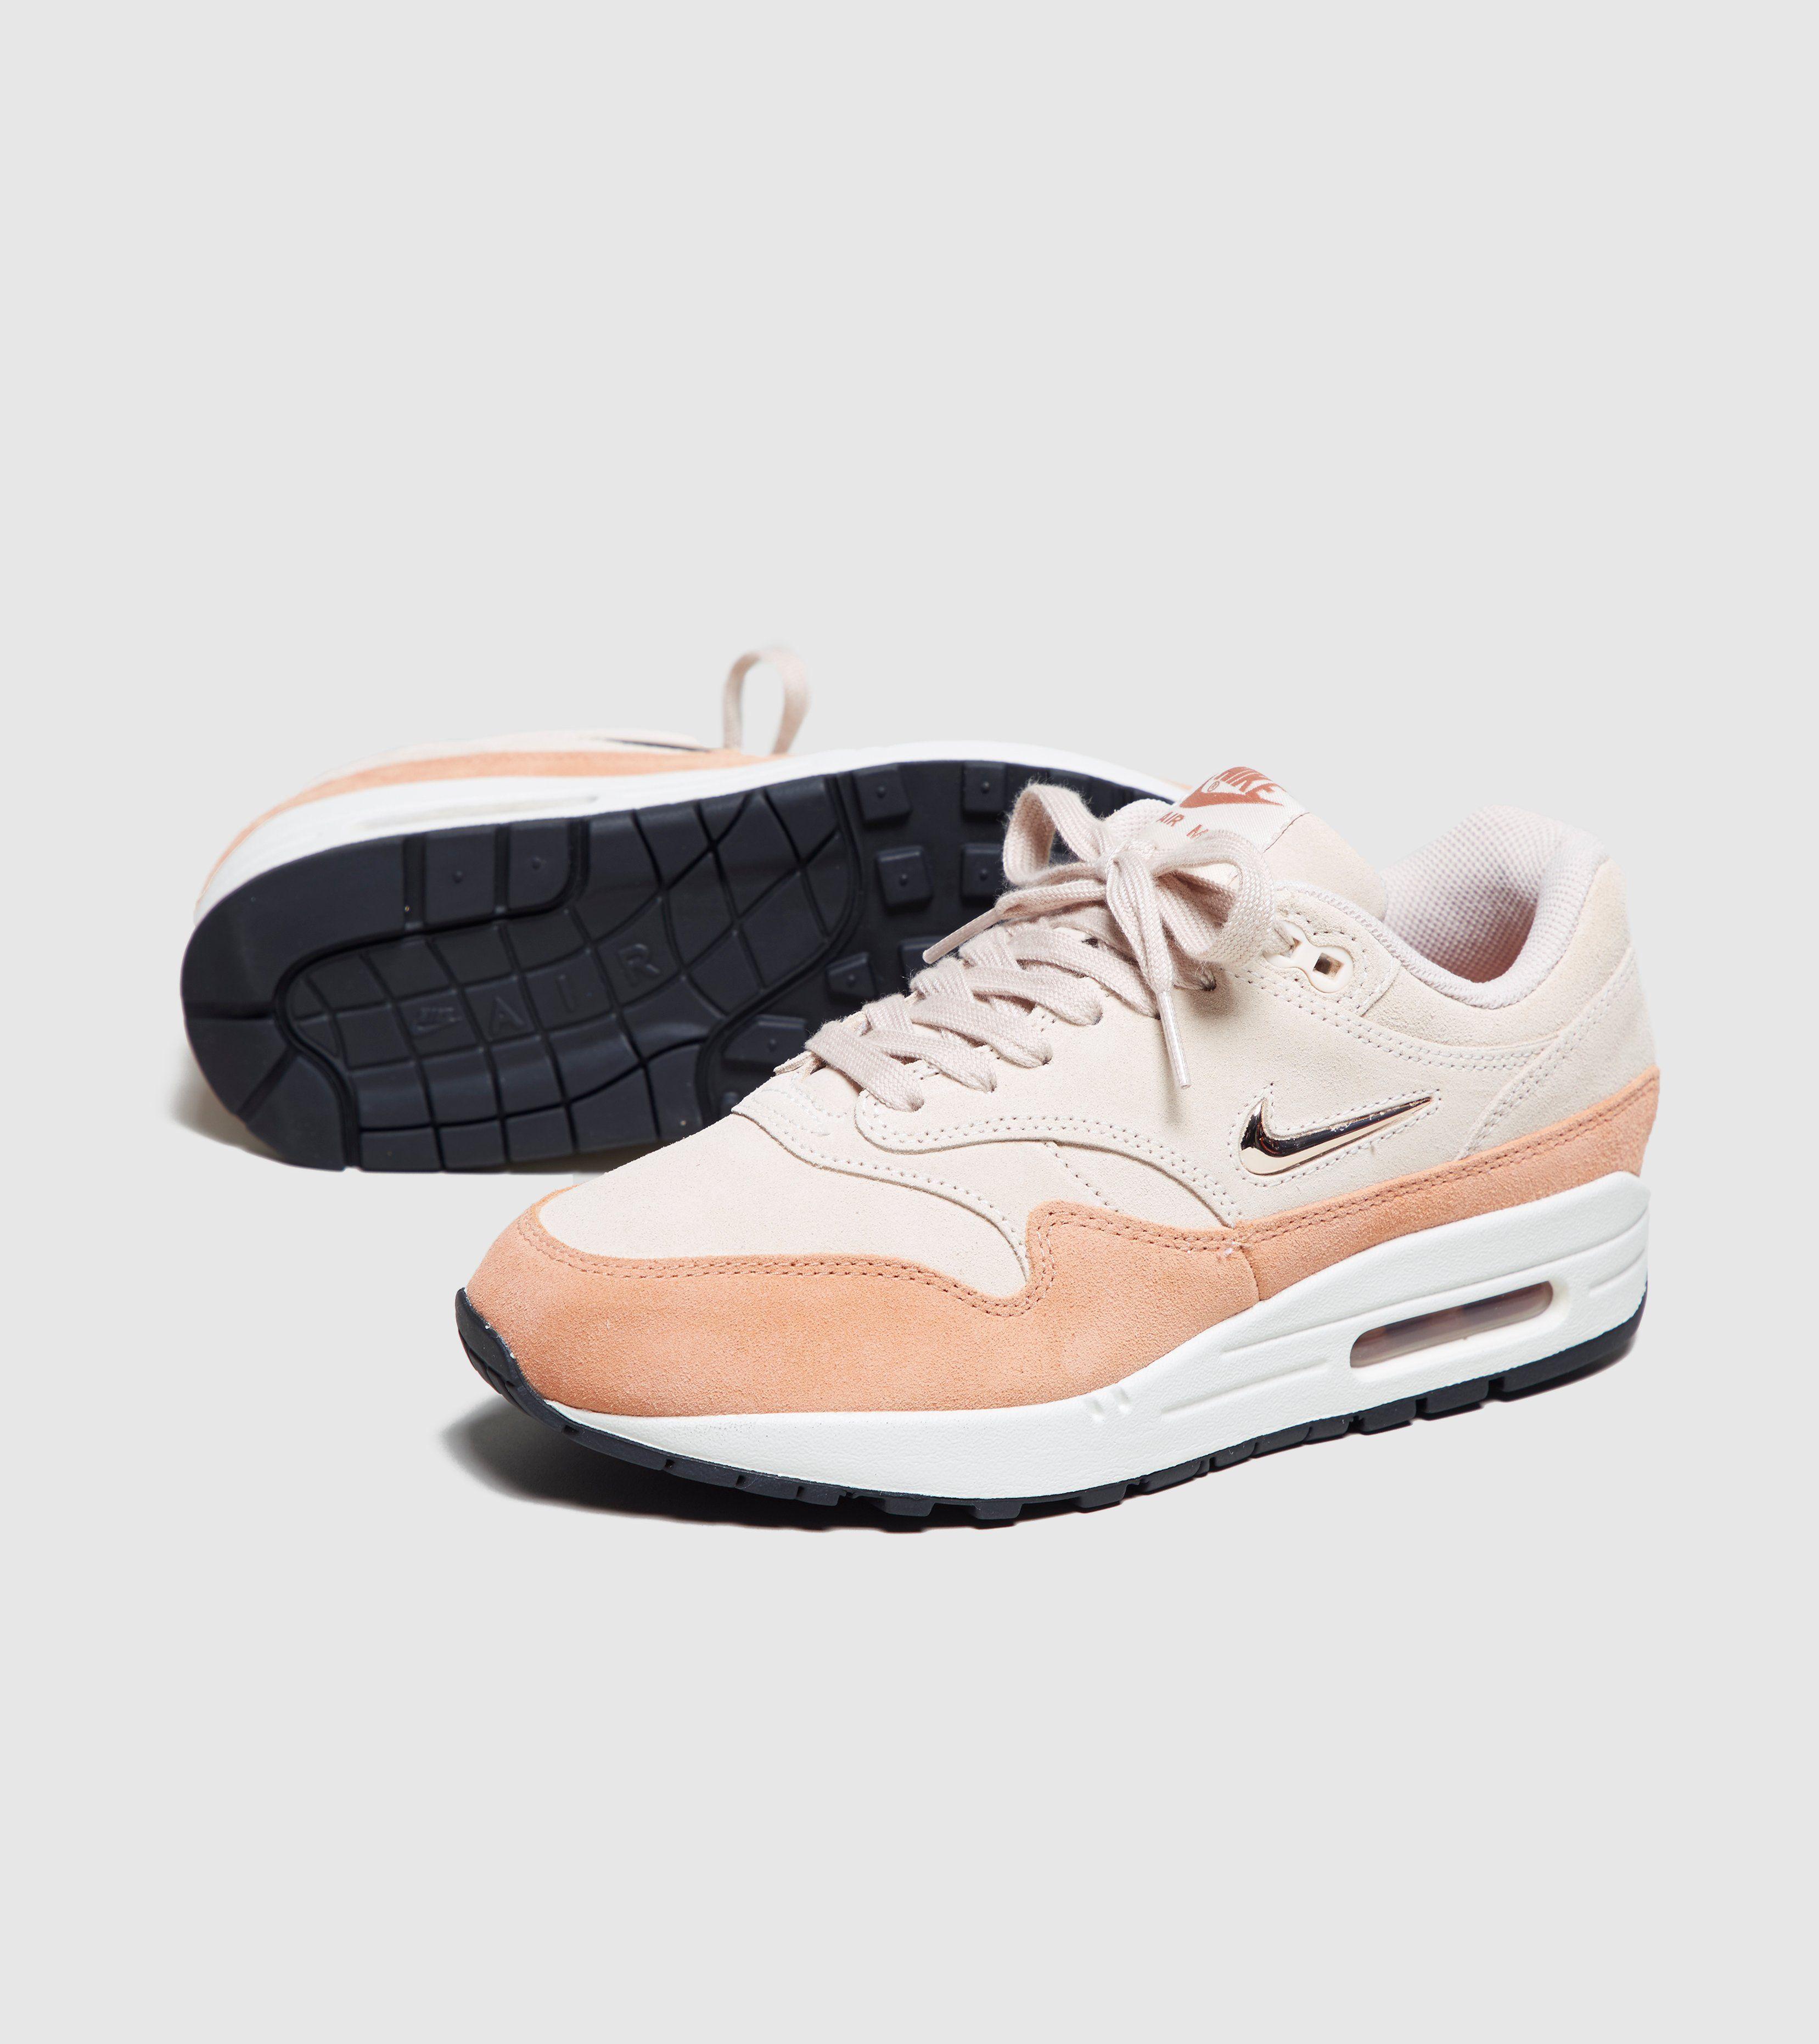 Nike Air Max 1 Jewel Femme